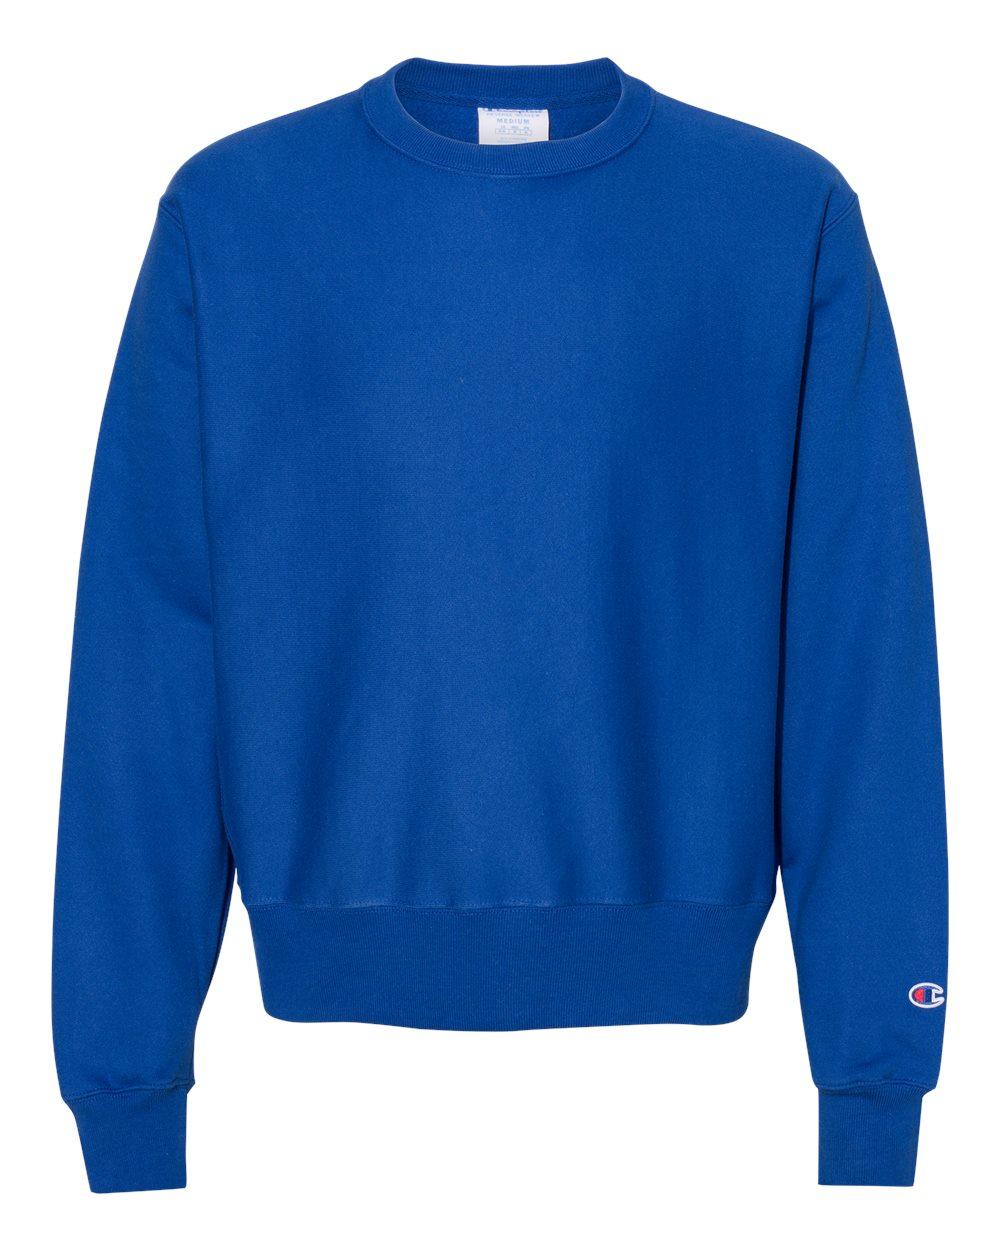 Champion-Mens-Reverse-Weave-Crewneck-Sweatshirt-Blank-Solid-S149-up-to-3XL thumbnail 6